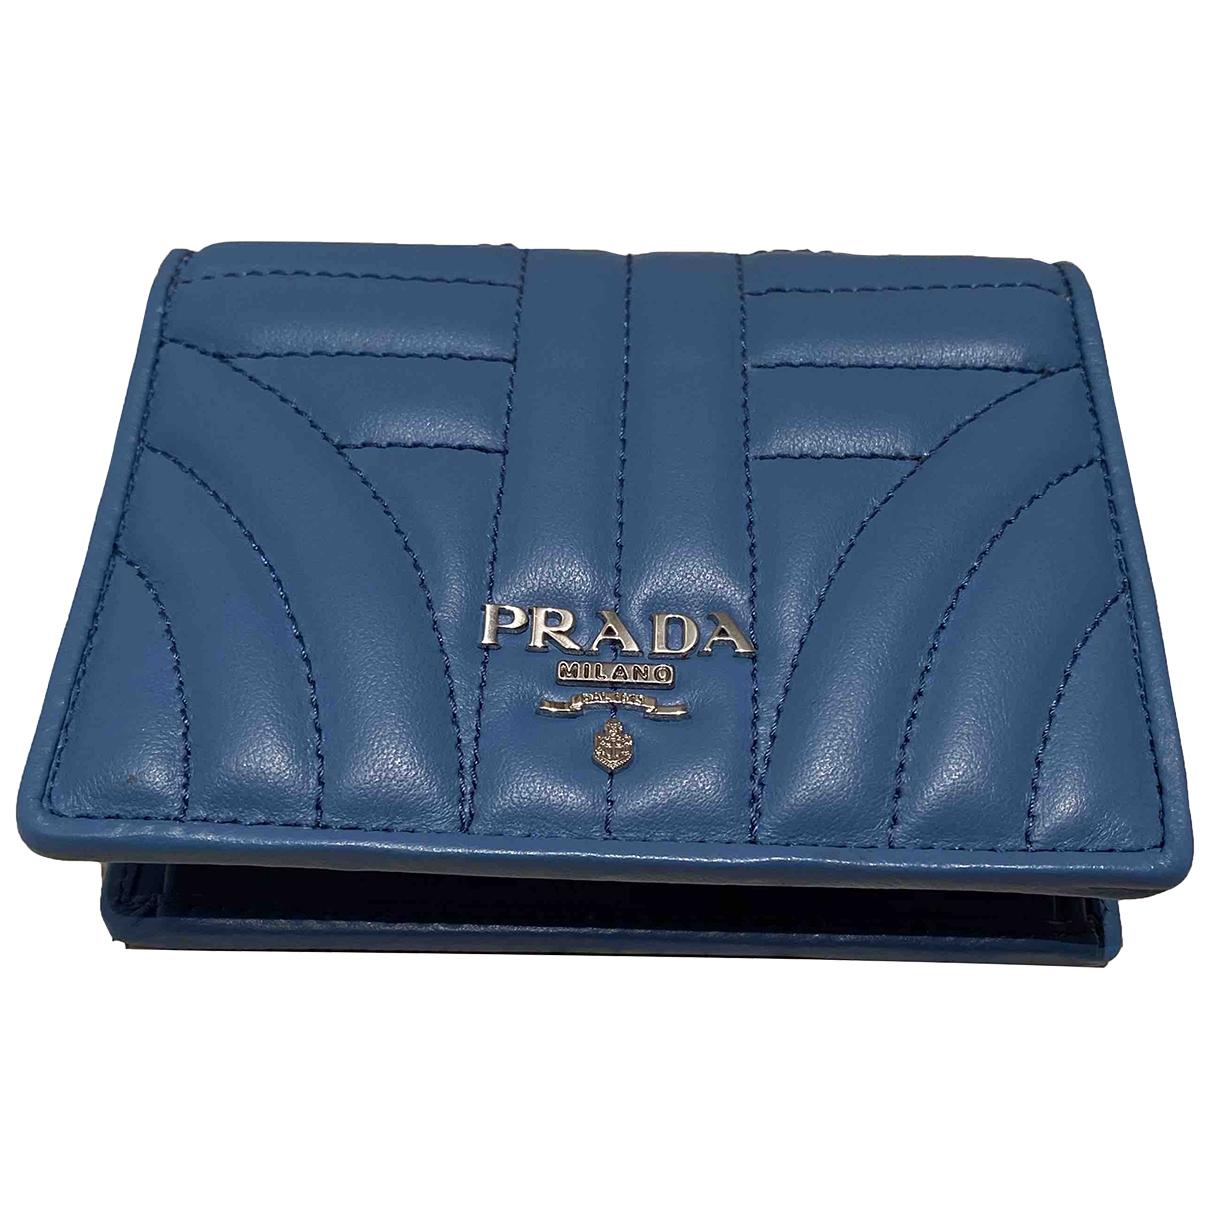 Prada \N Turquoise Leather wallet for Women \N